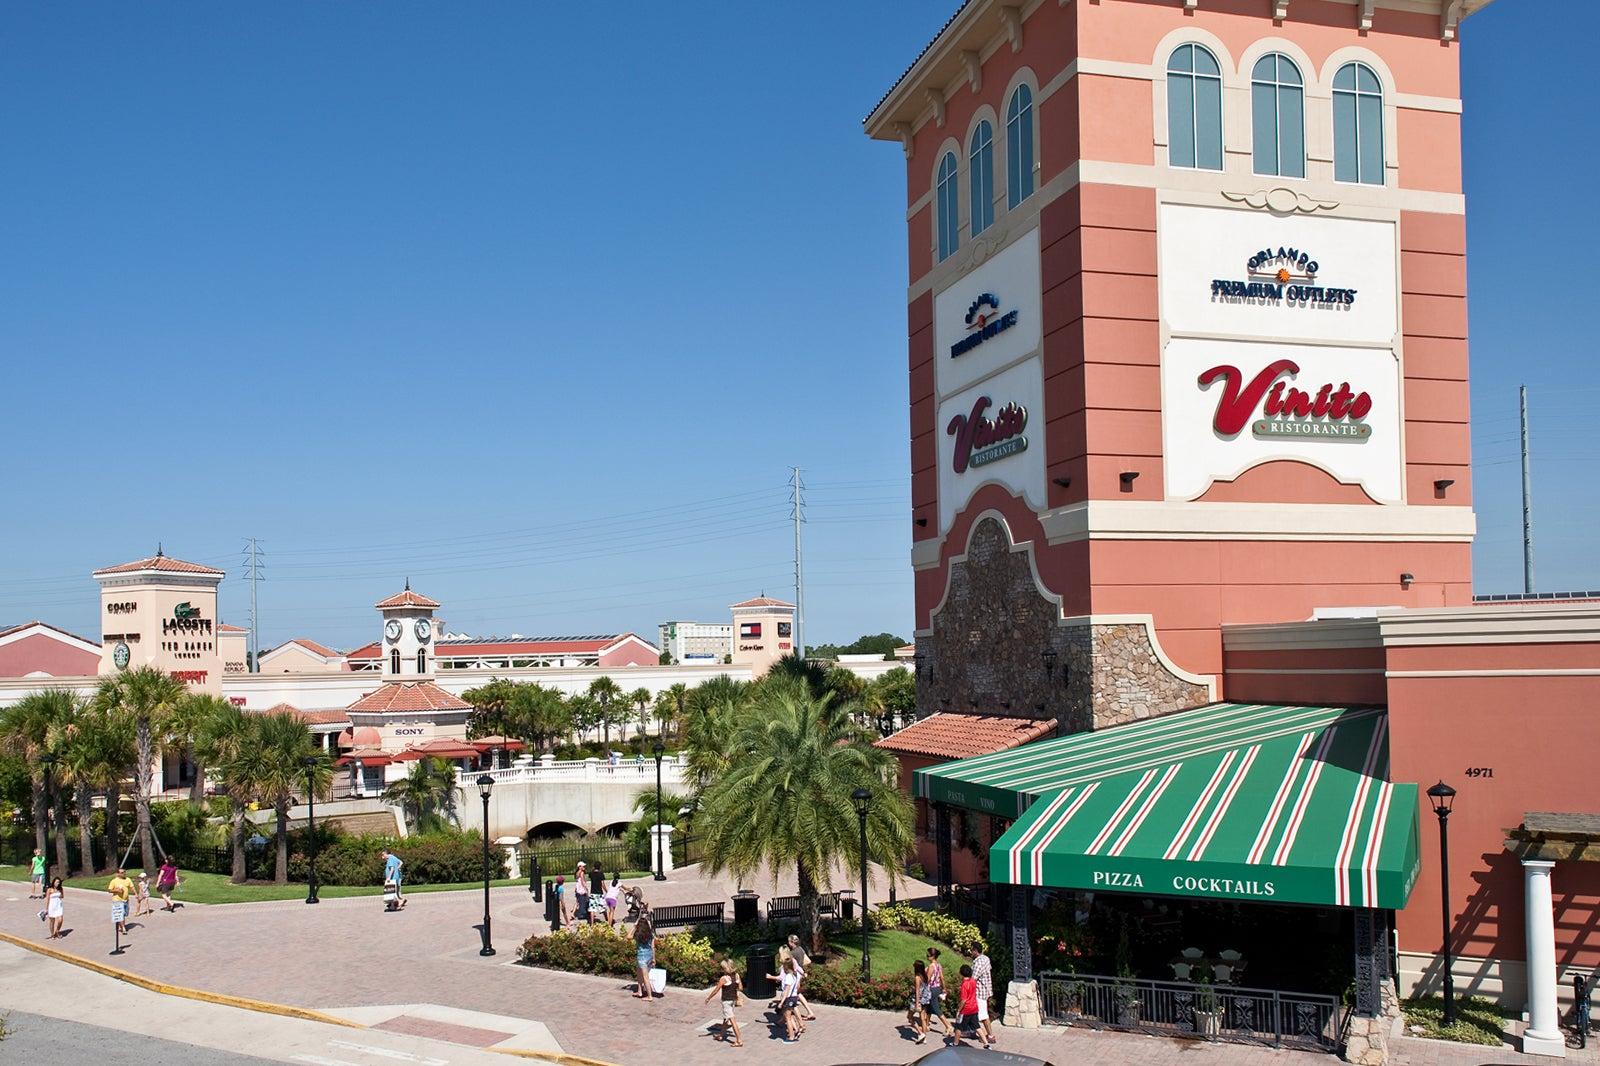 Torrente dedo Humedal  Orlando International Premium Outlets - Huge Outlet Mall on International  Drive